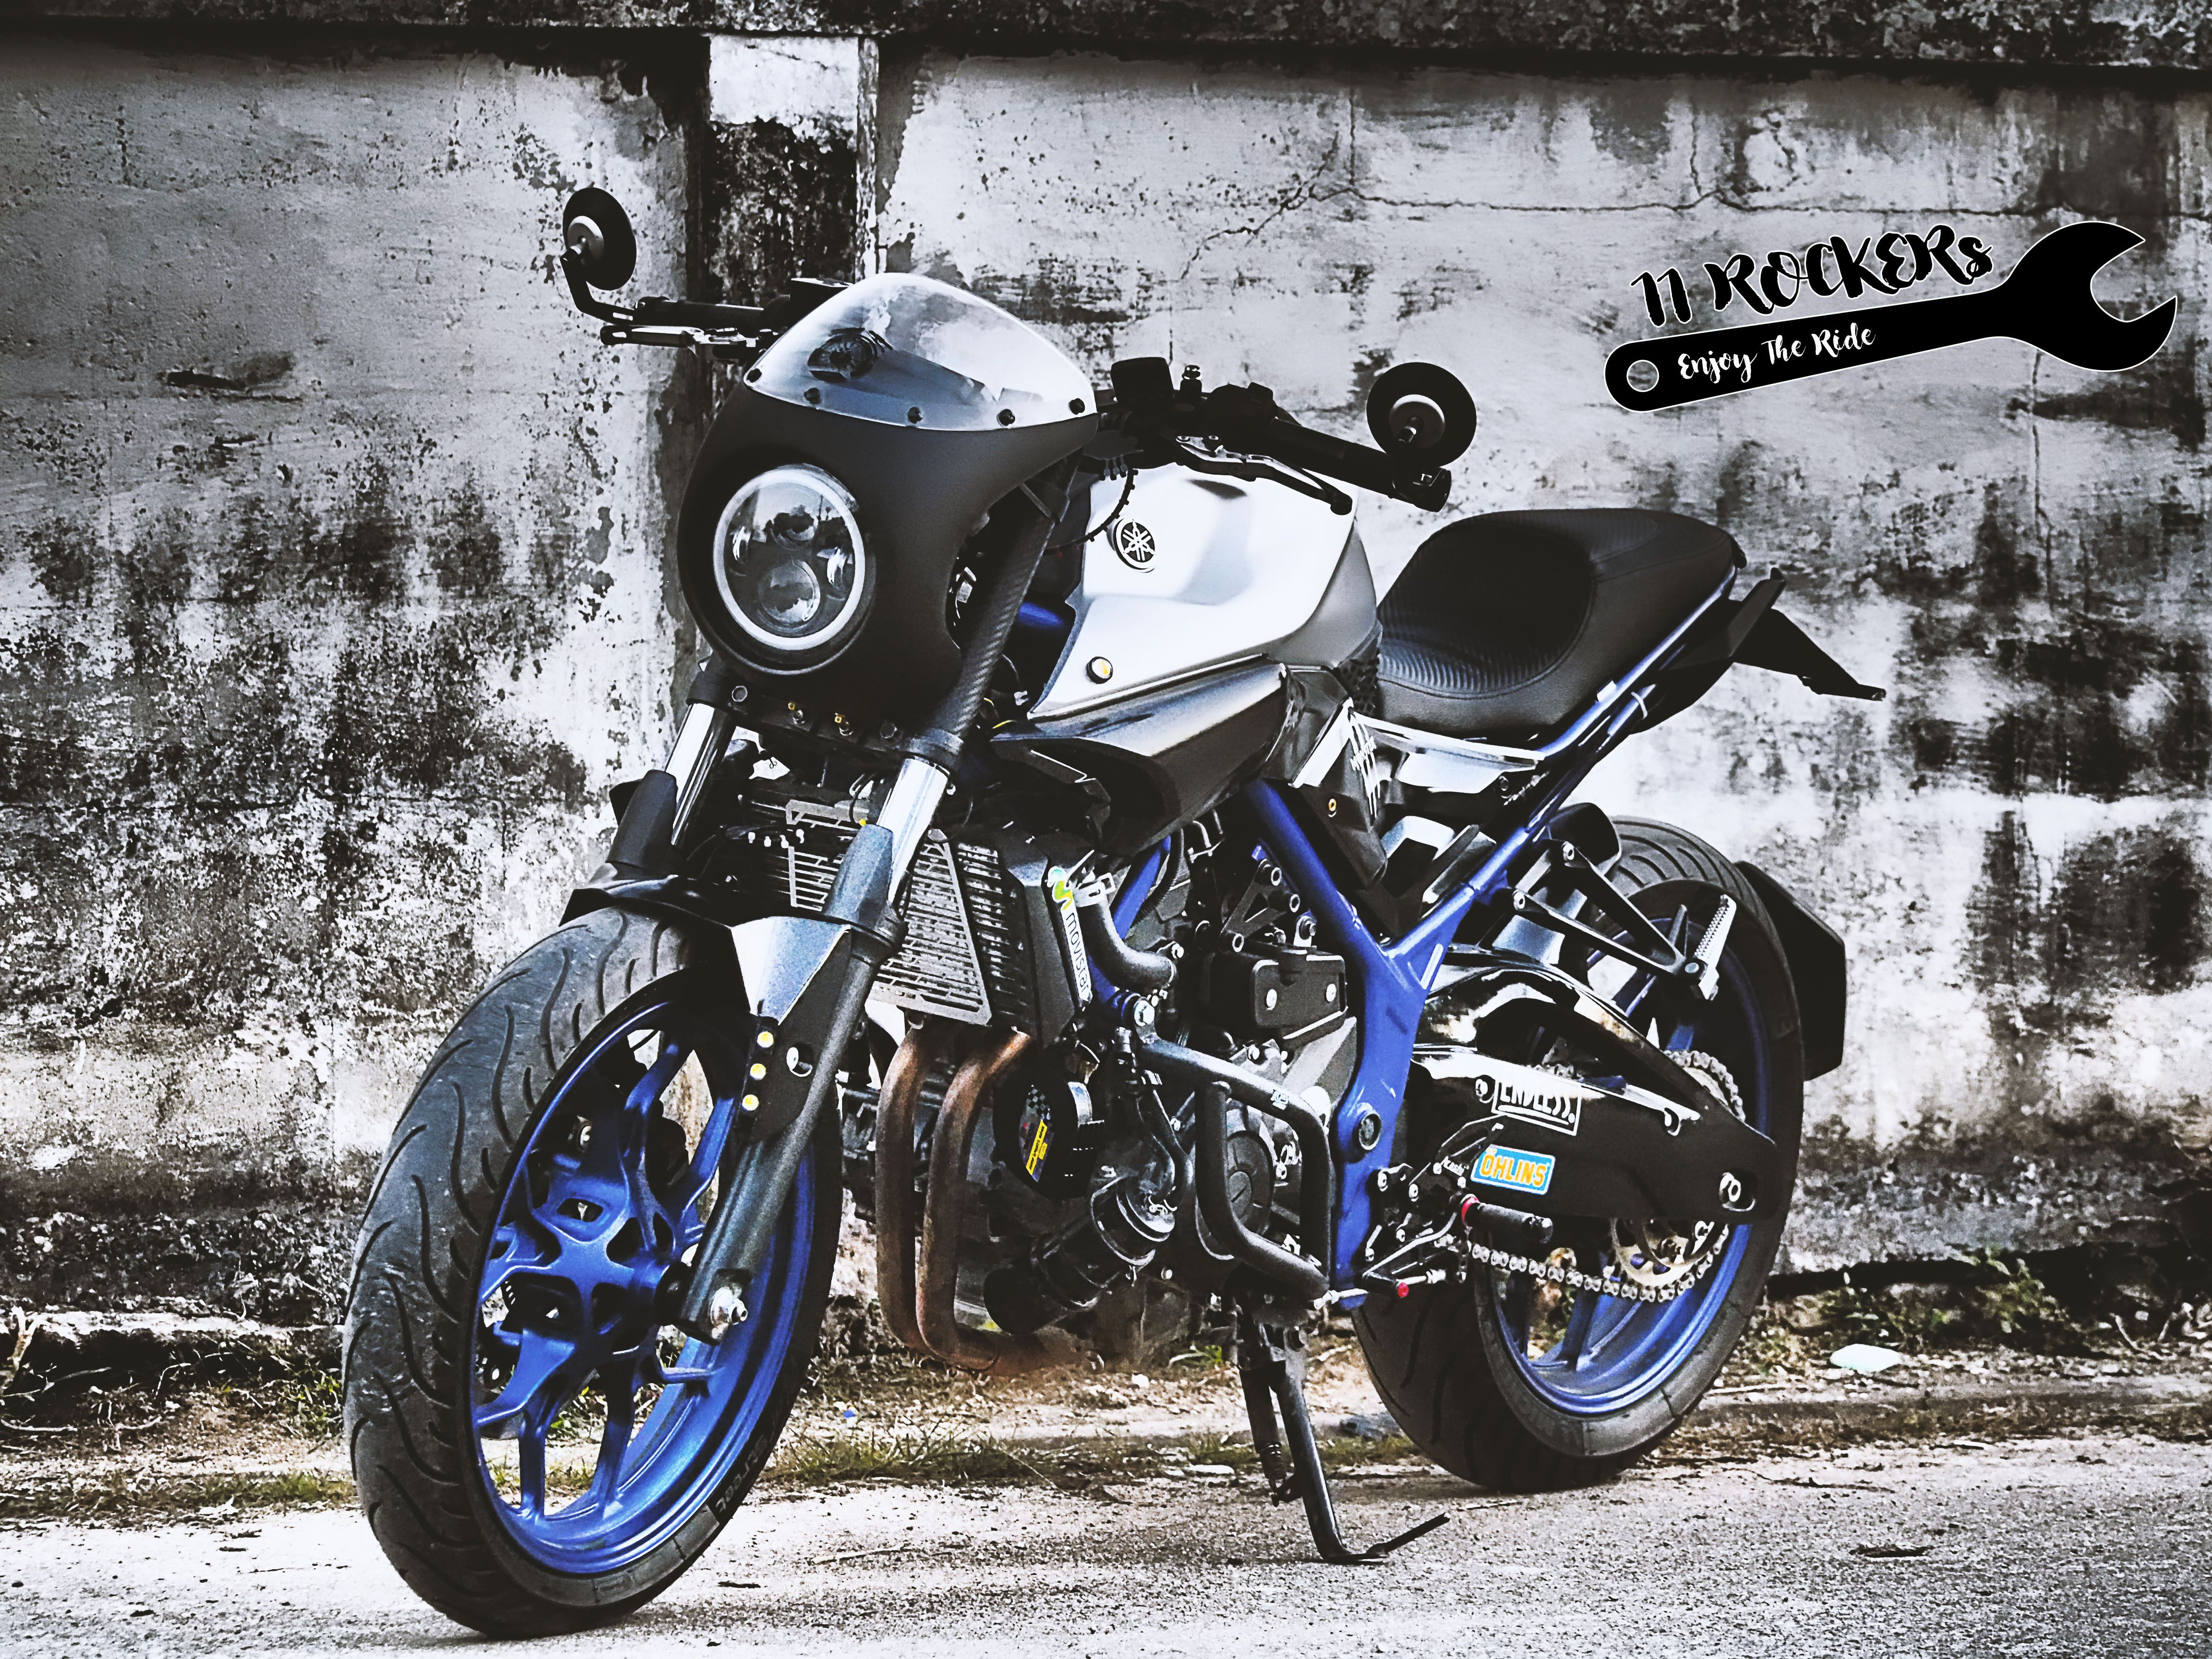 Moto yamaha scrambler cars motorcycles bobber forward mt09 yamaha - Yamaha Mt 03 Custom By 11rockers Garage Club